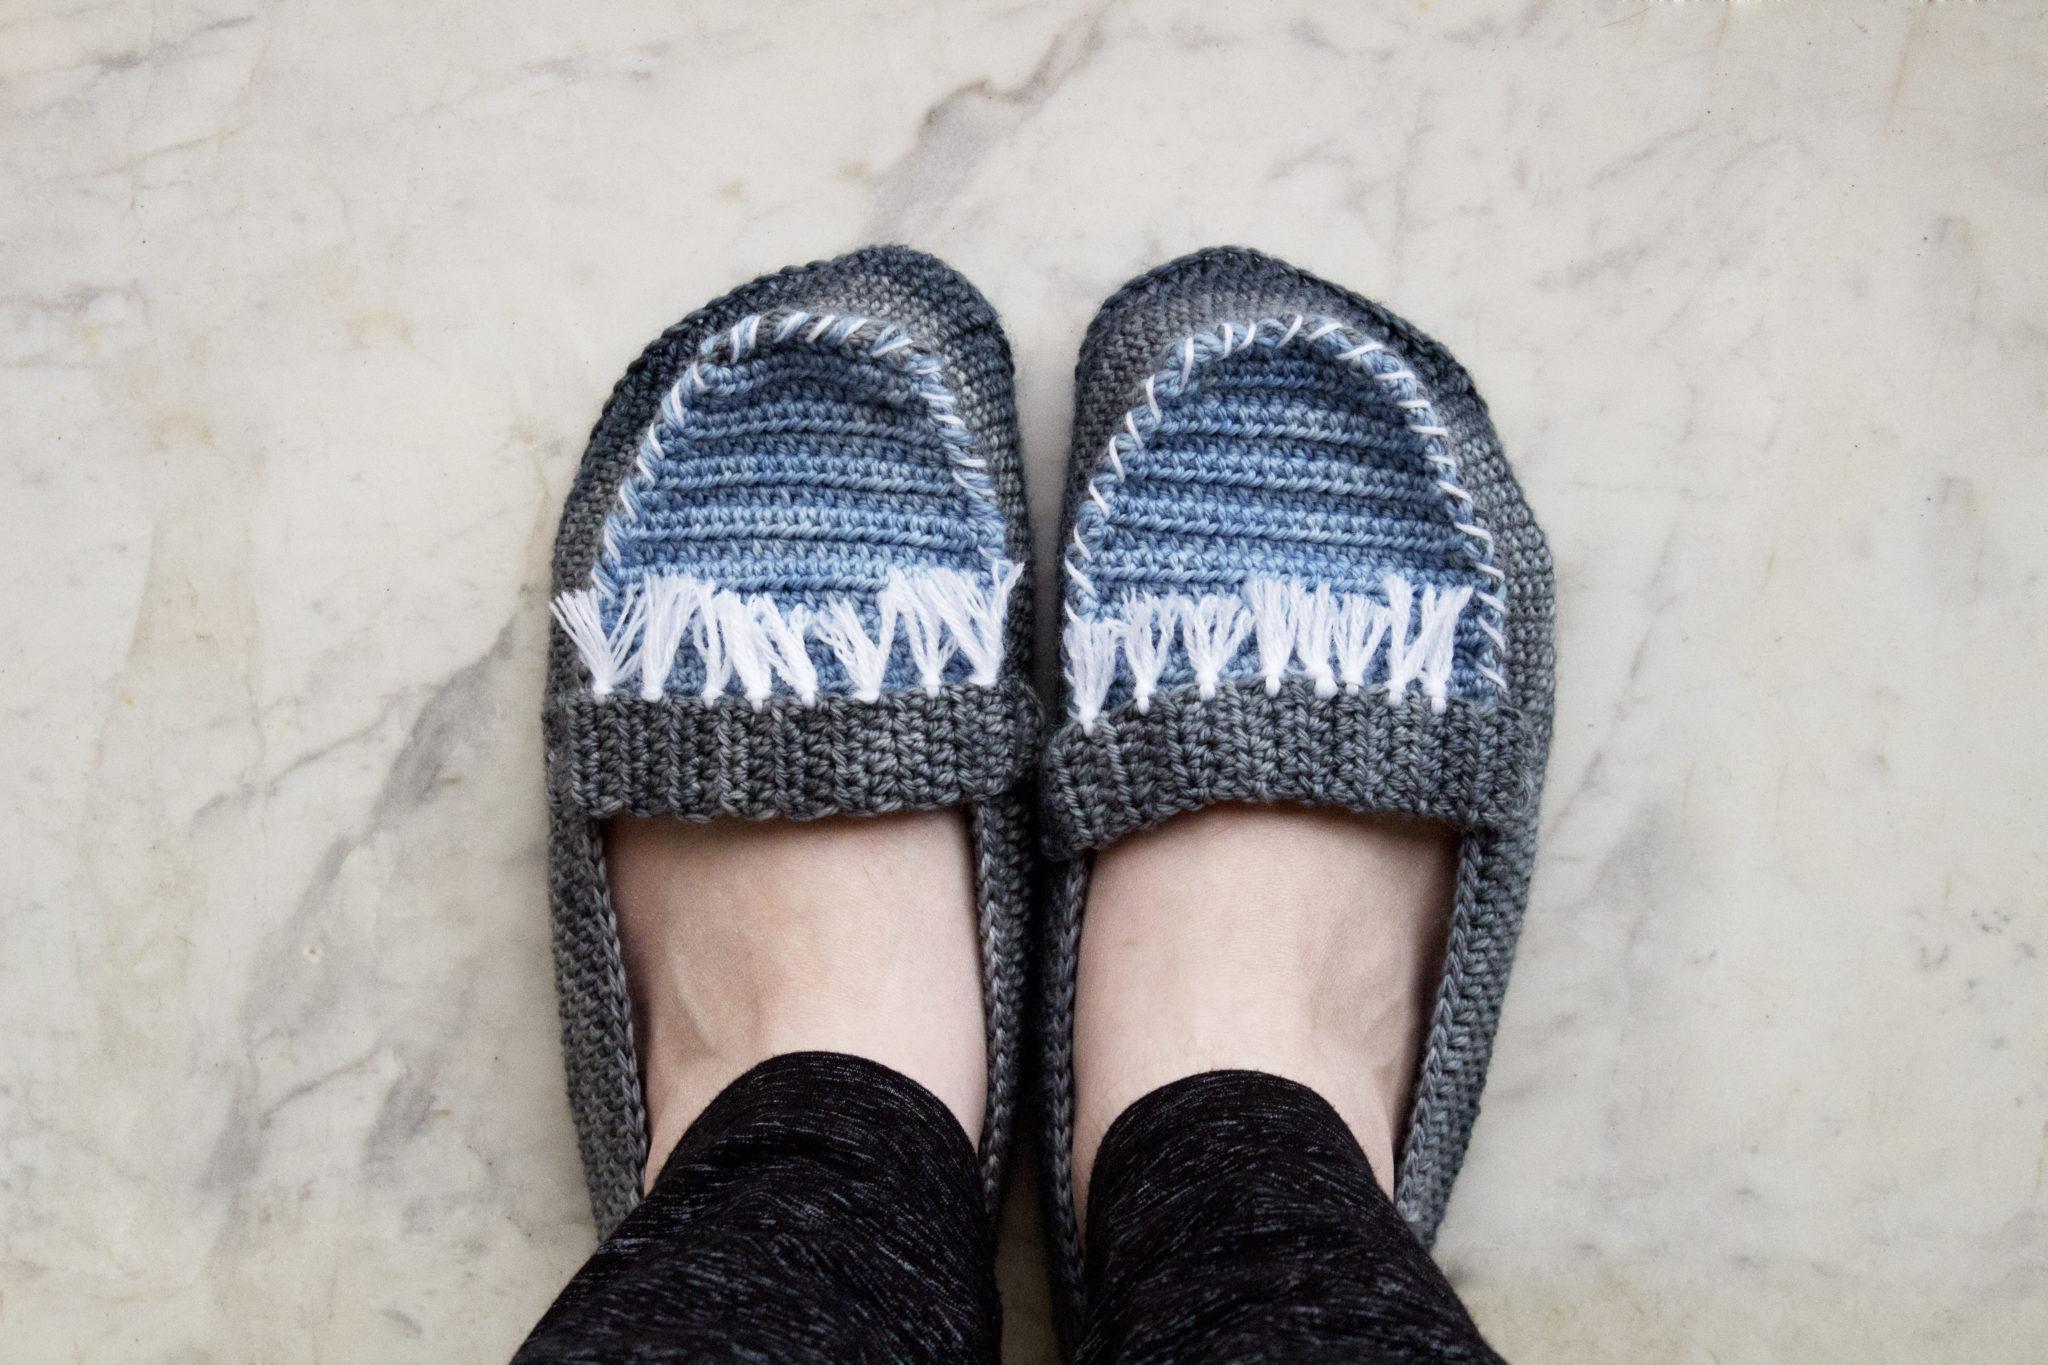 Moccasin Slippers Crochet Pattern Free Pattern My Accessory Box